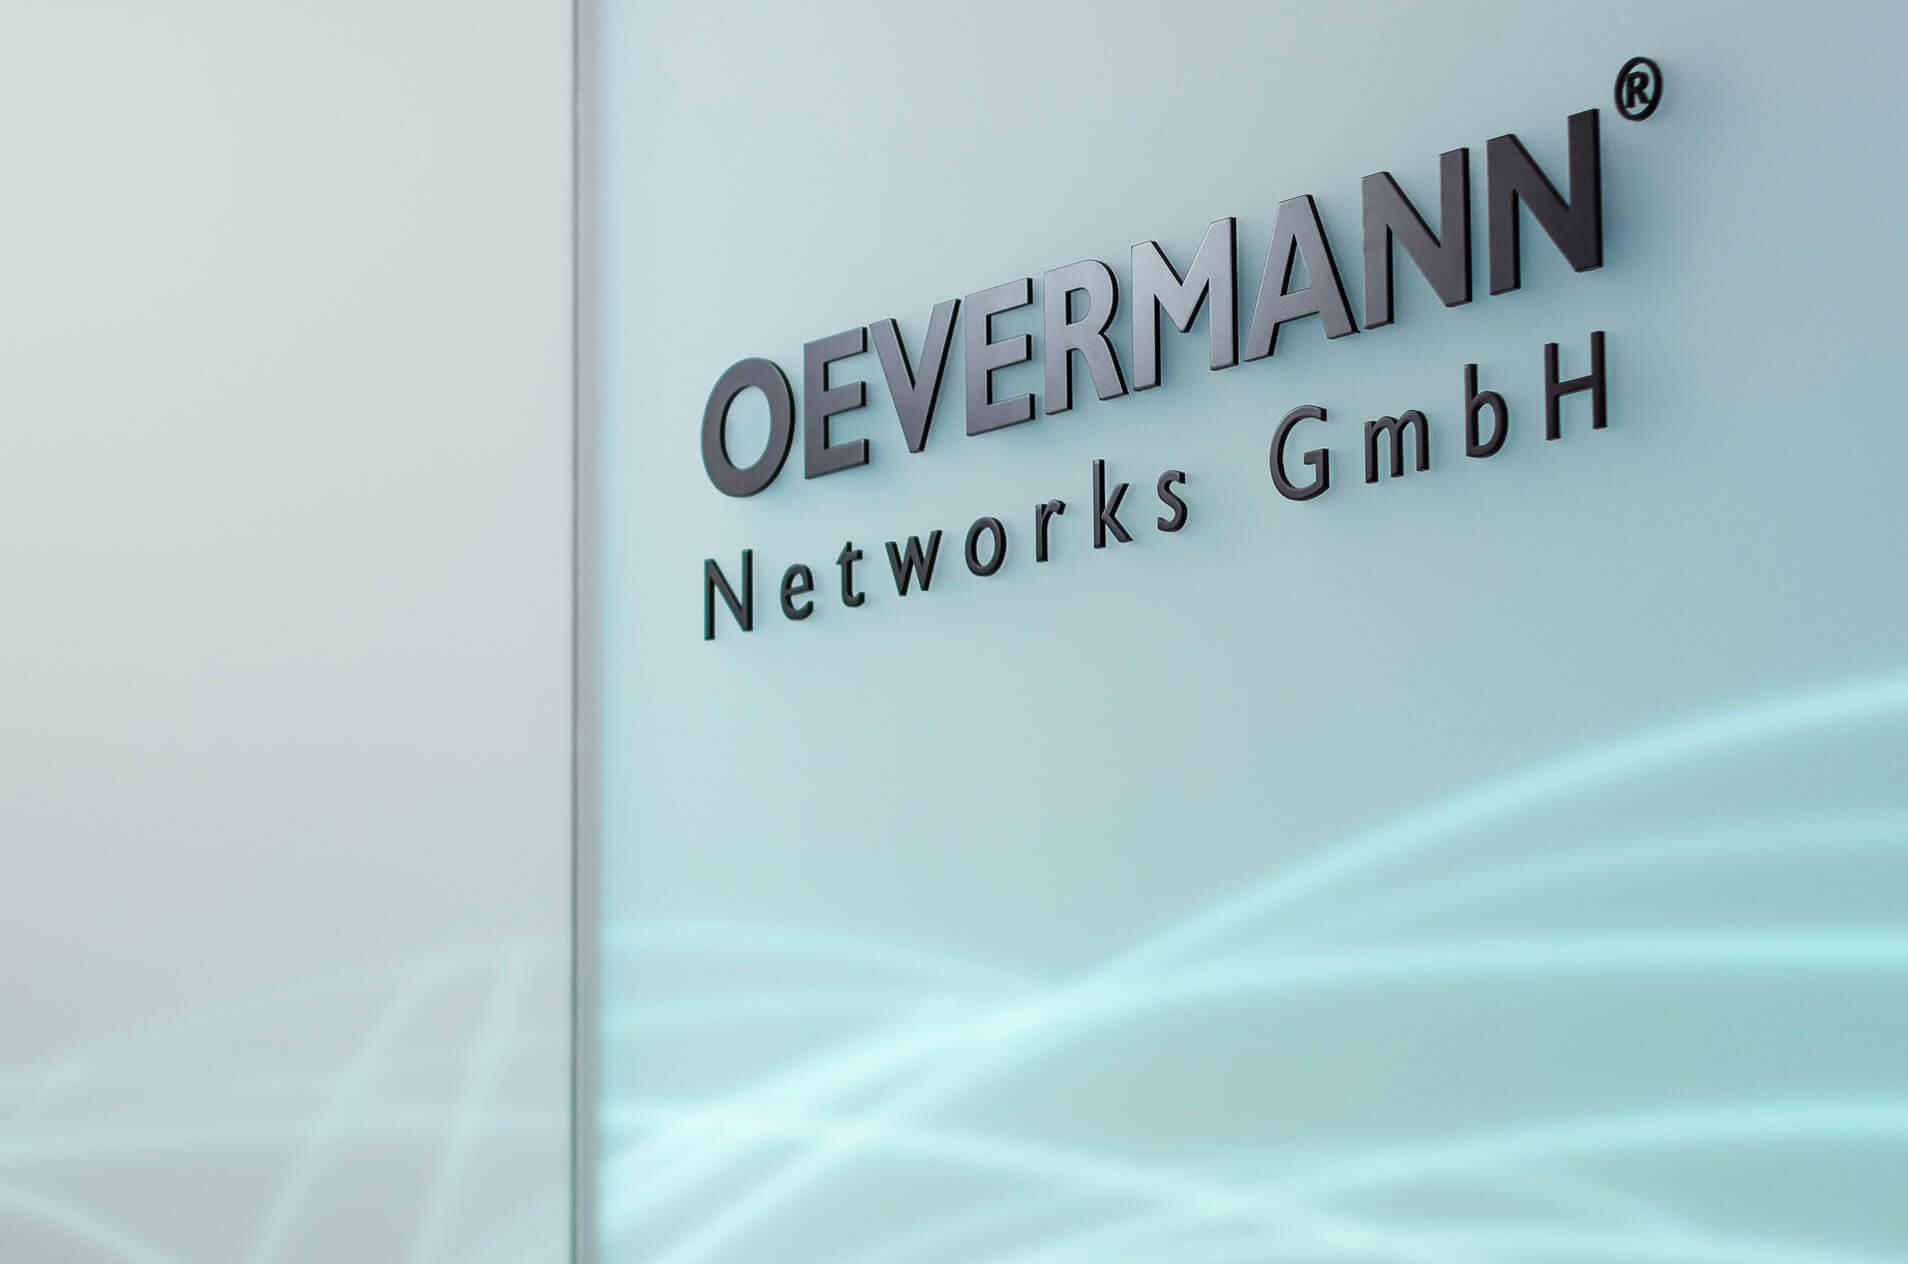 OEVERMANN Networks GmbH